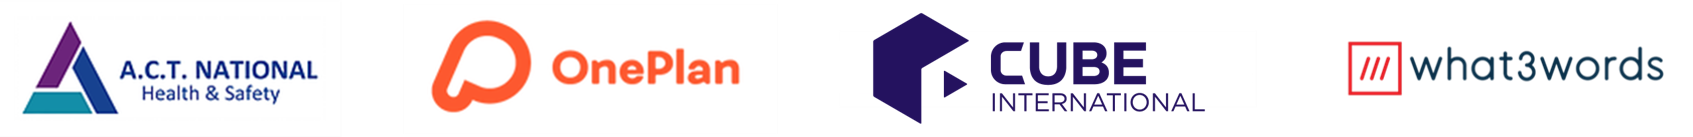 safe event scheme main partner logos